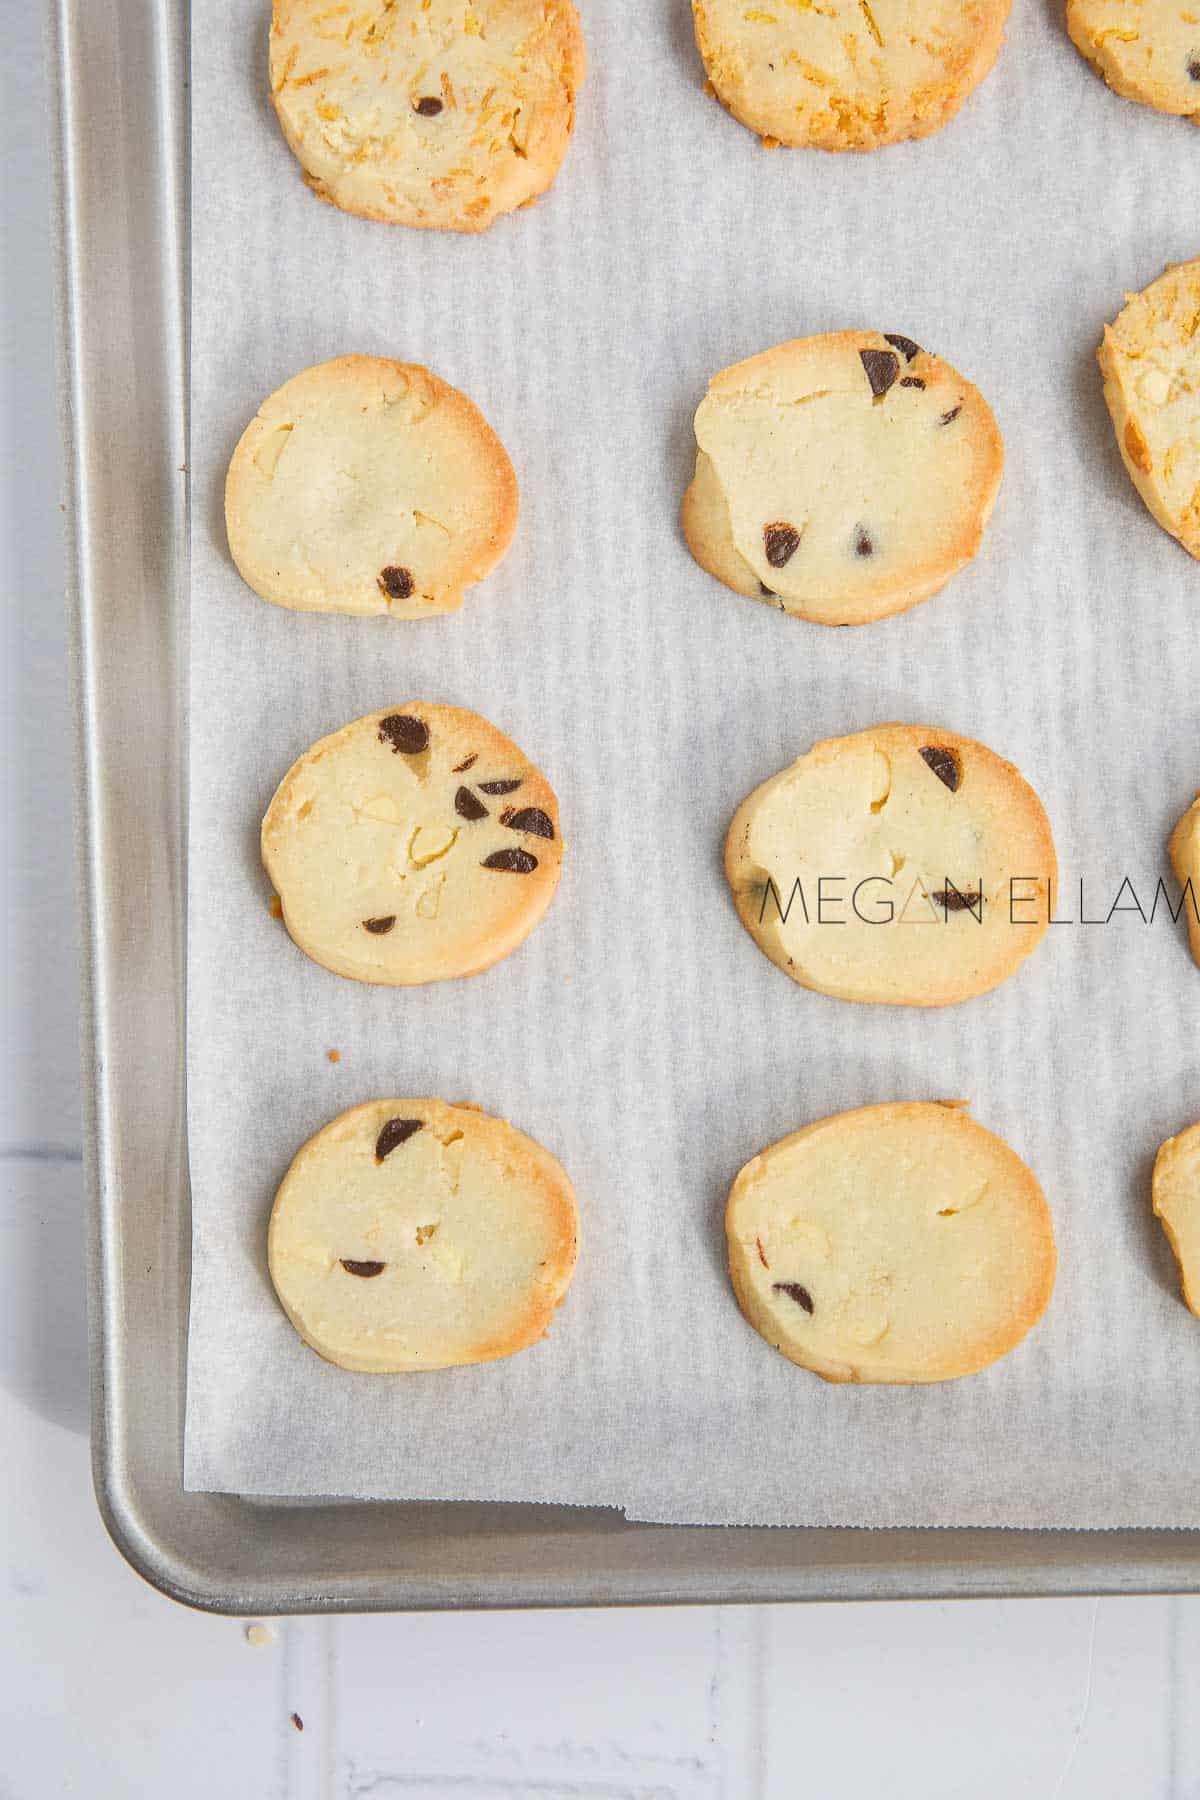 Almond Flour Cookies on a baking tray.